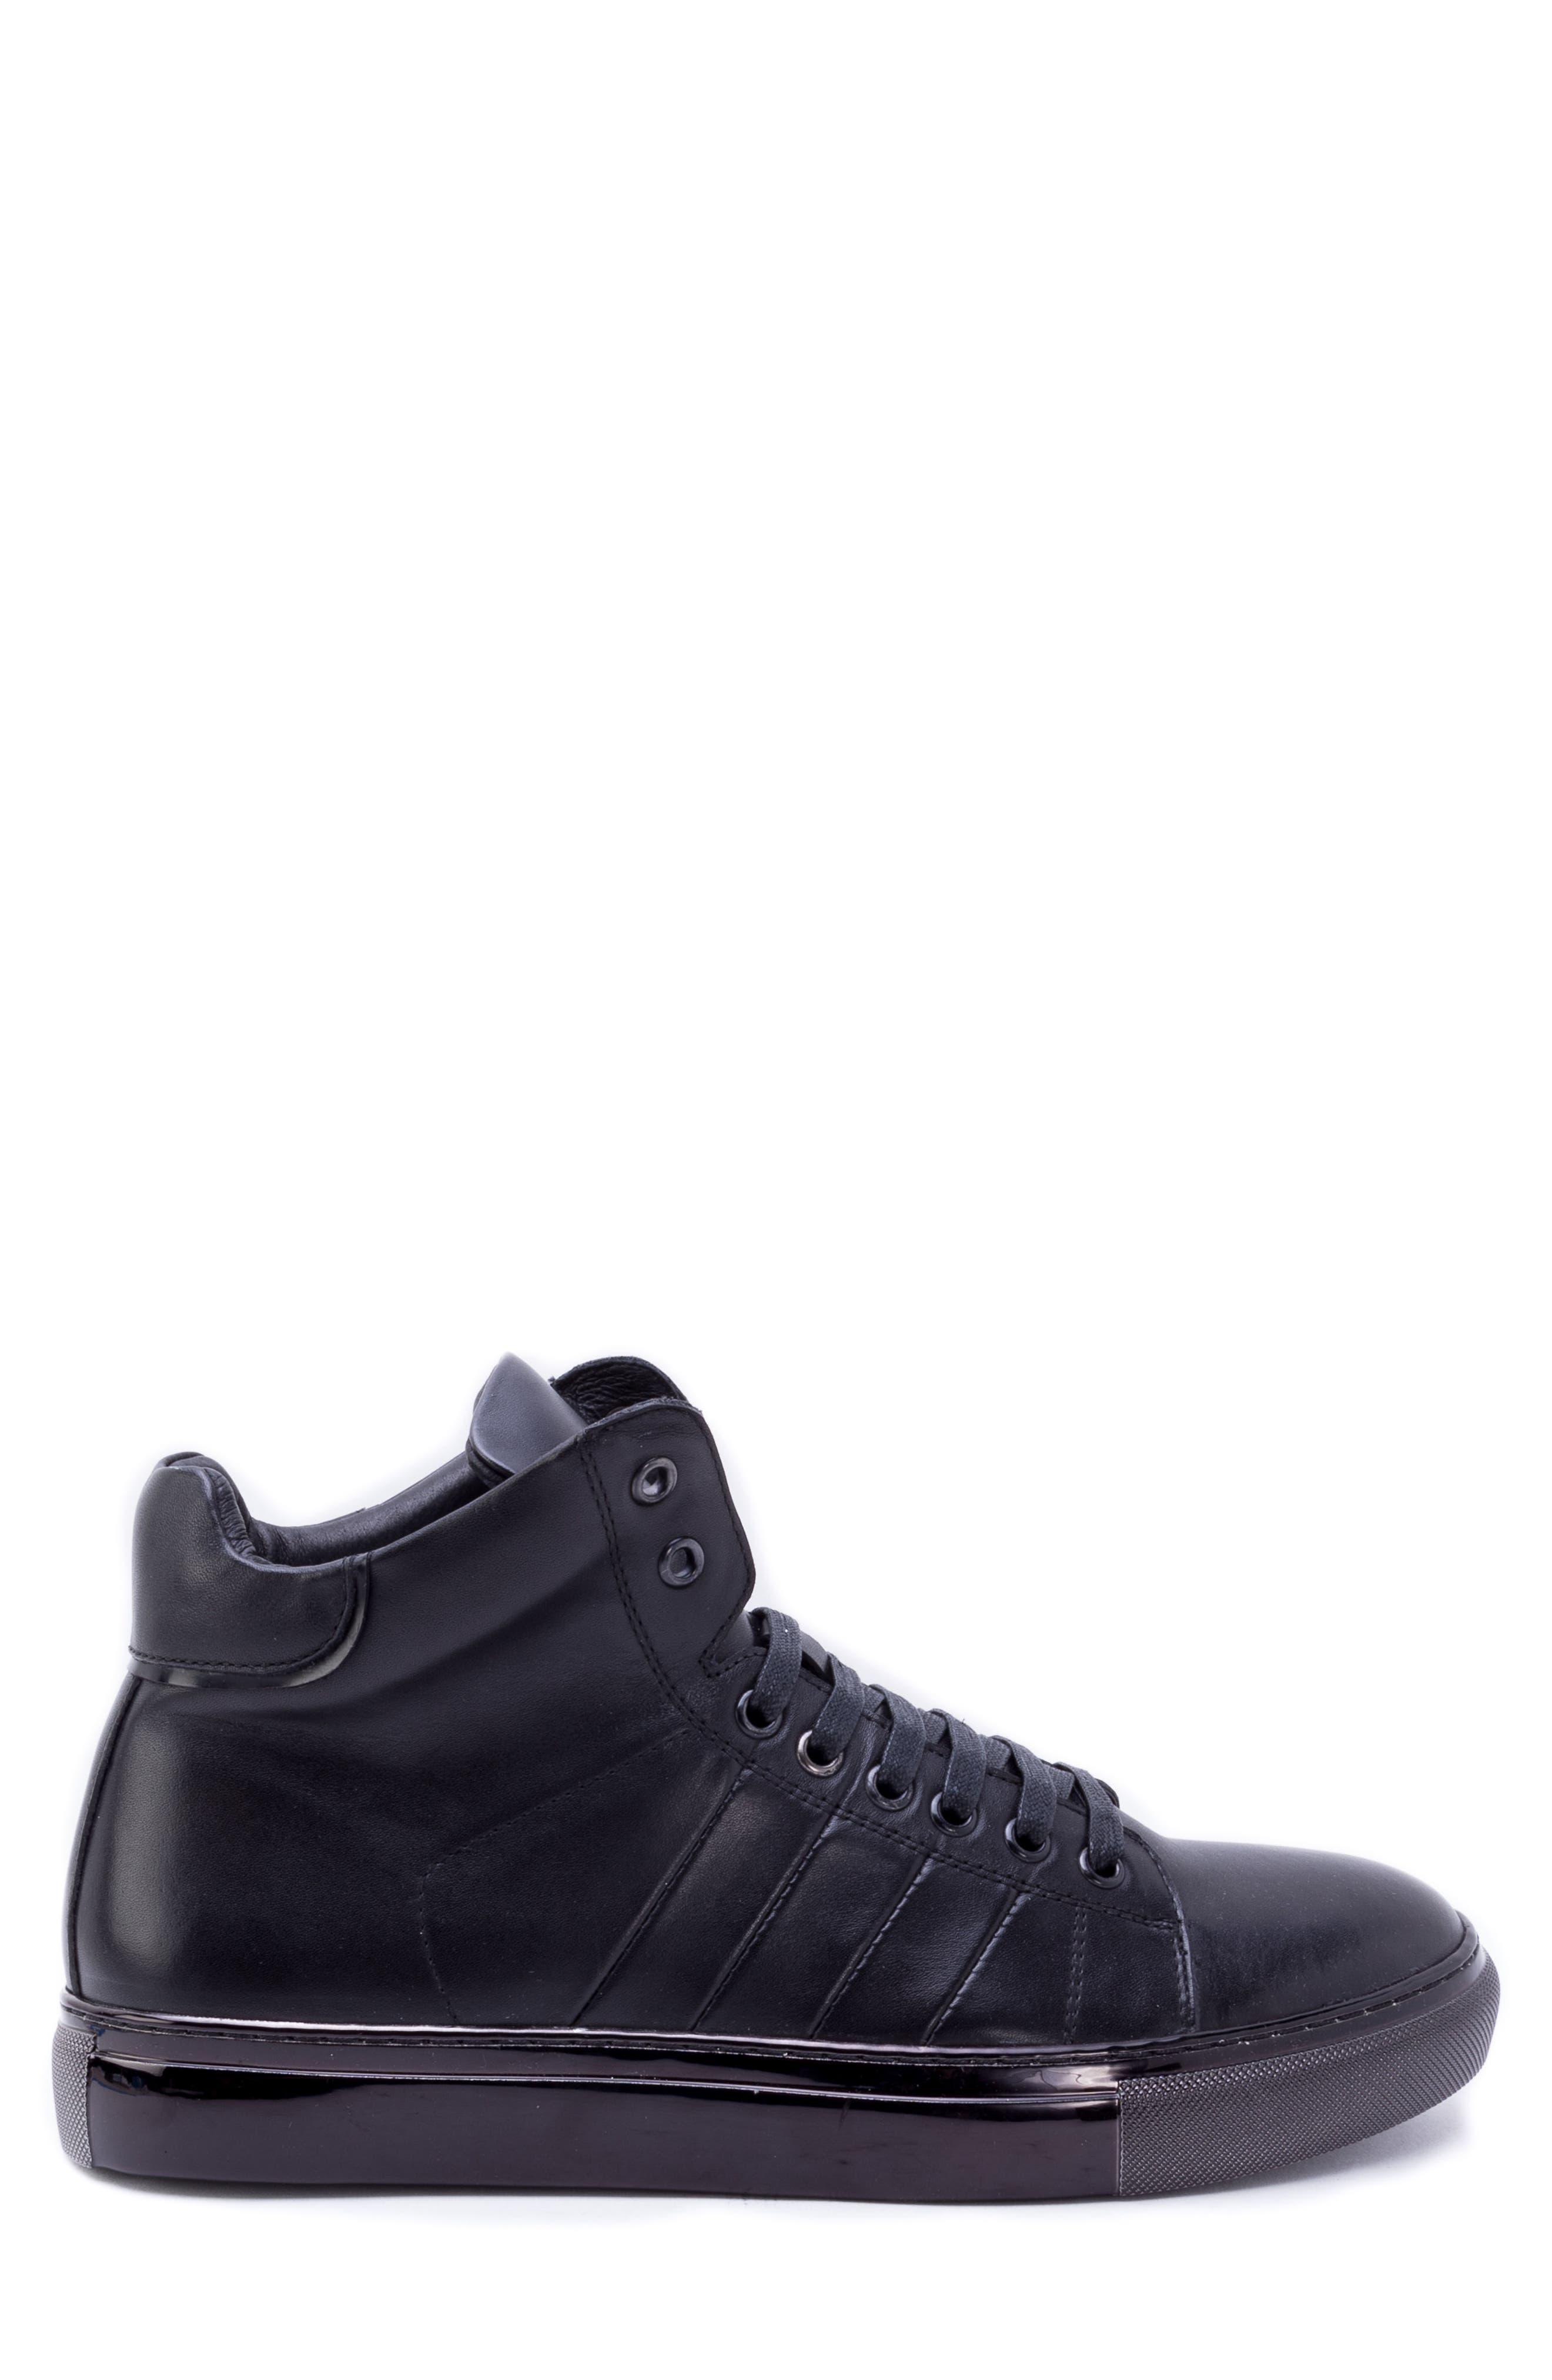 Crosby Sneaker,                             Alternate thumbnail 3, color,                             BLACK LEATHER